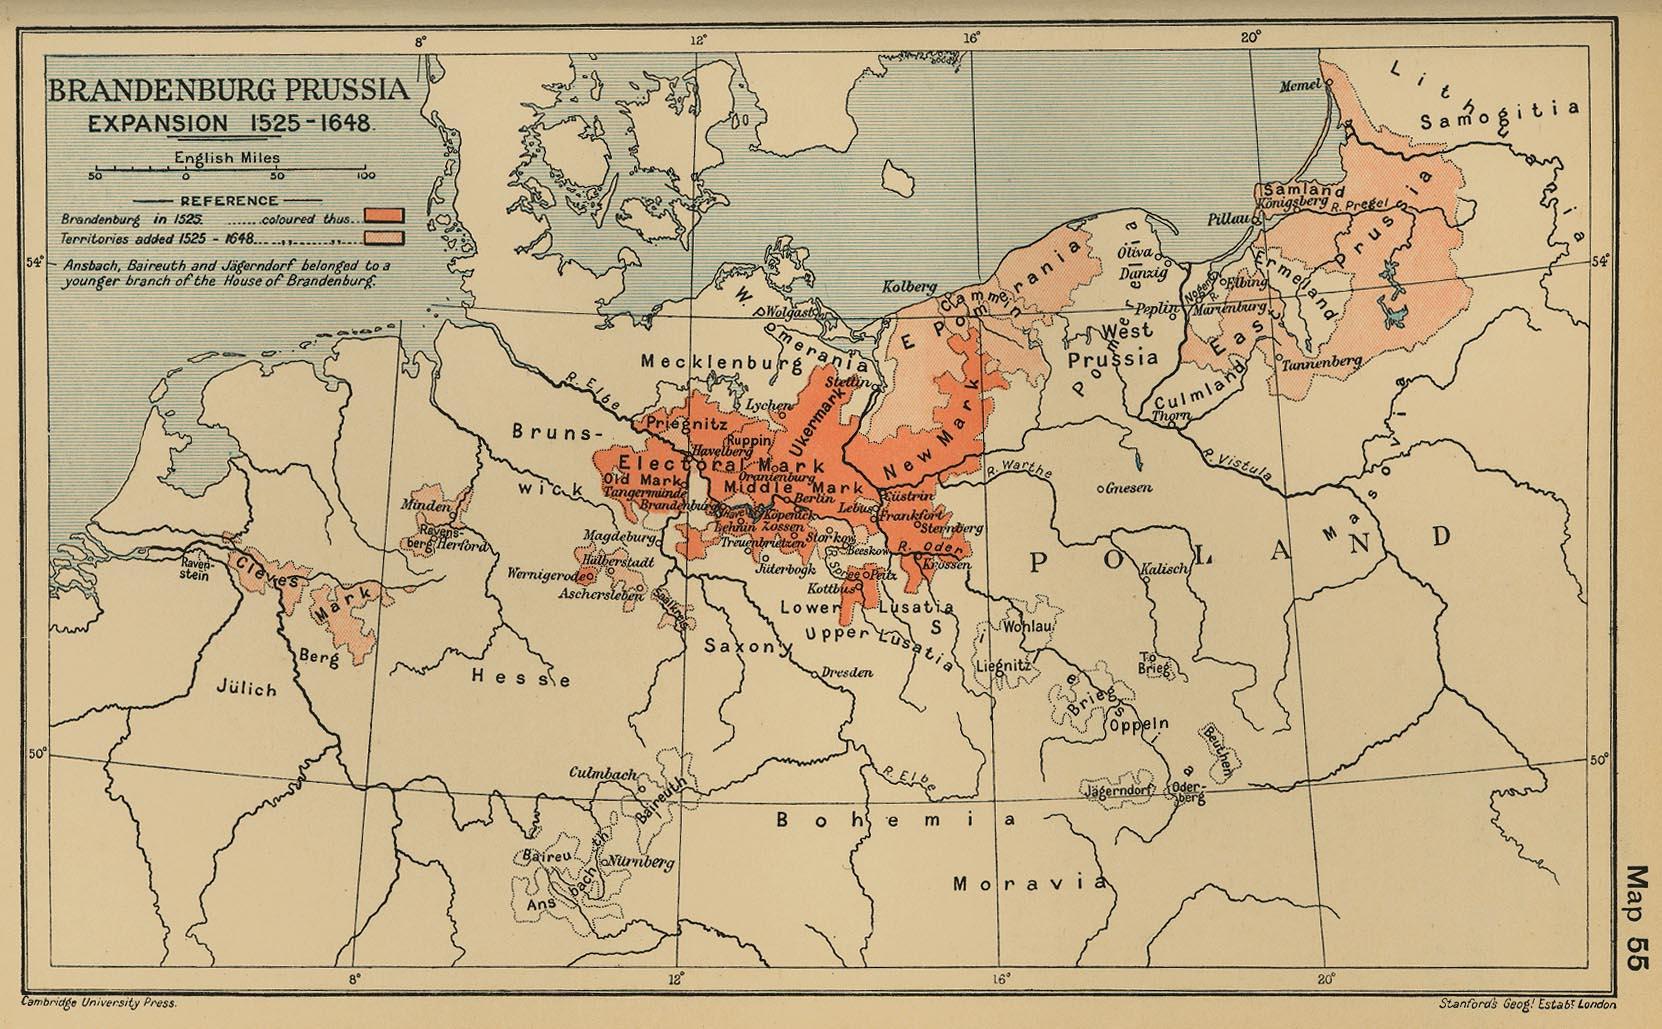 Cambridge Modern History Atlas 1912 Perry Castaneda Map